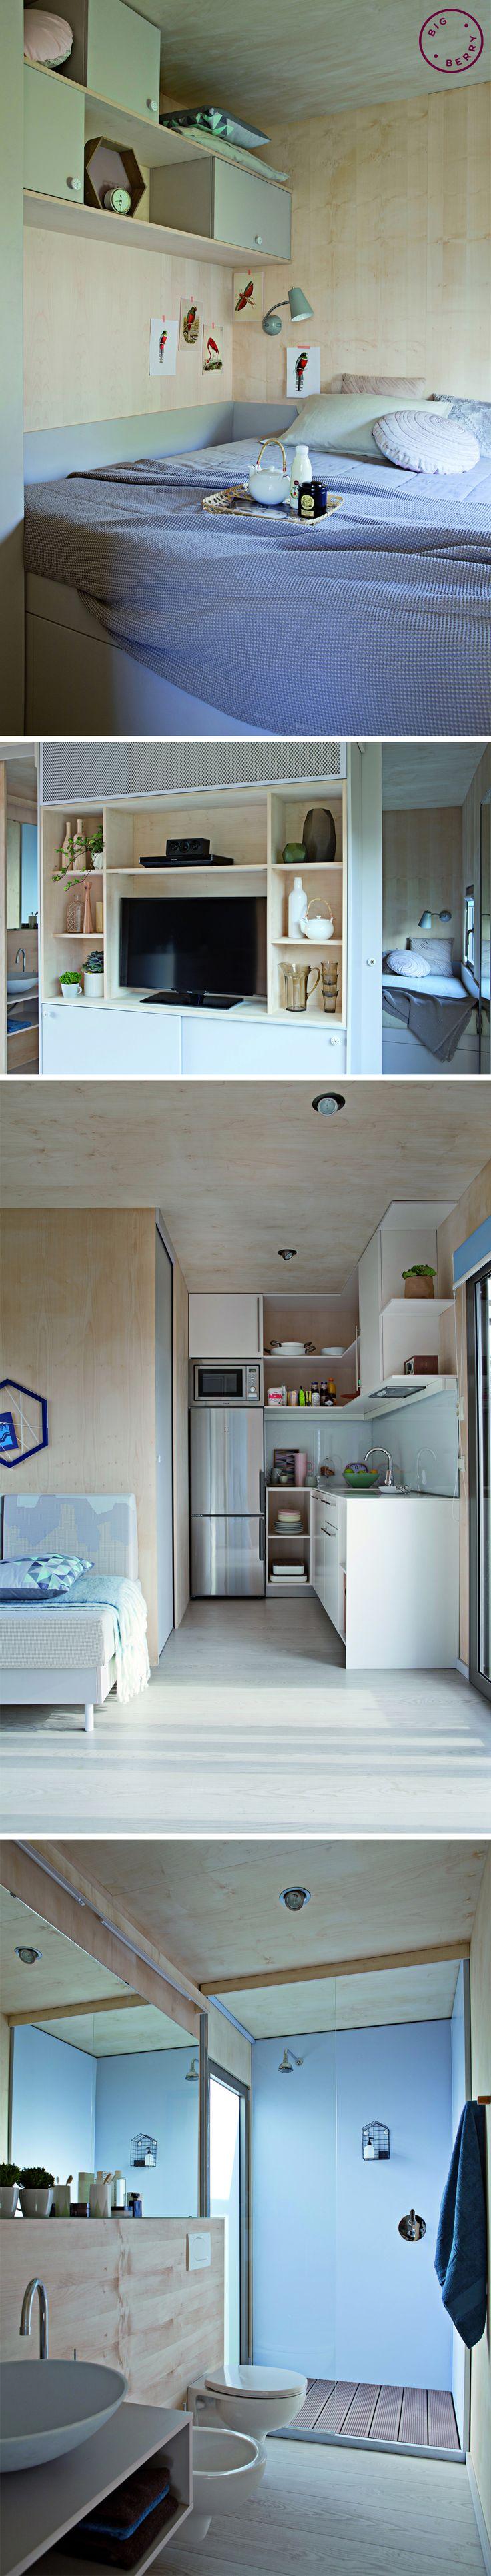 BIG BERRY luxury mobile houses